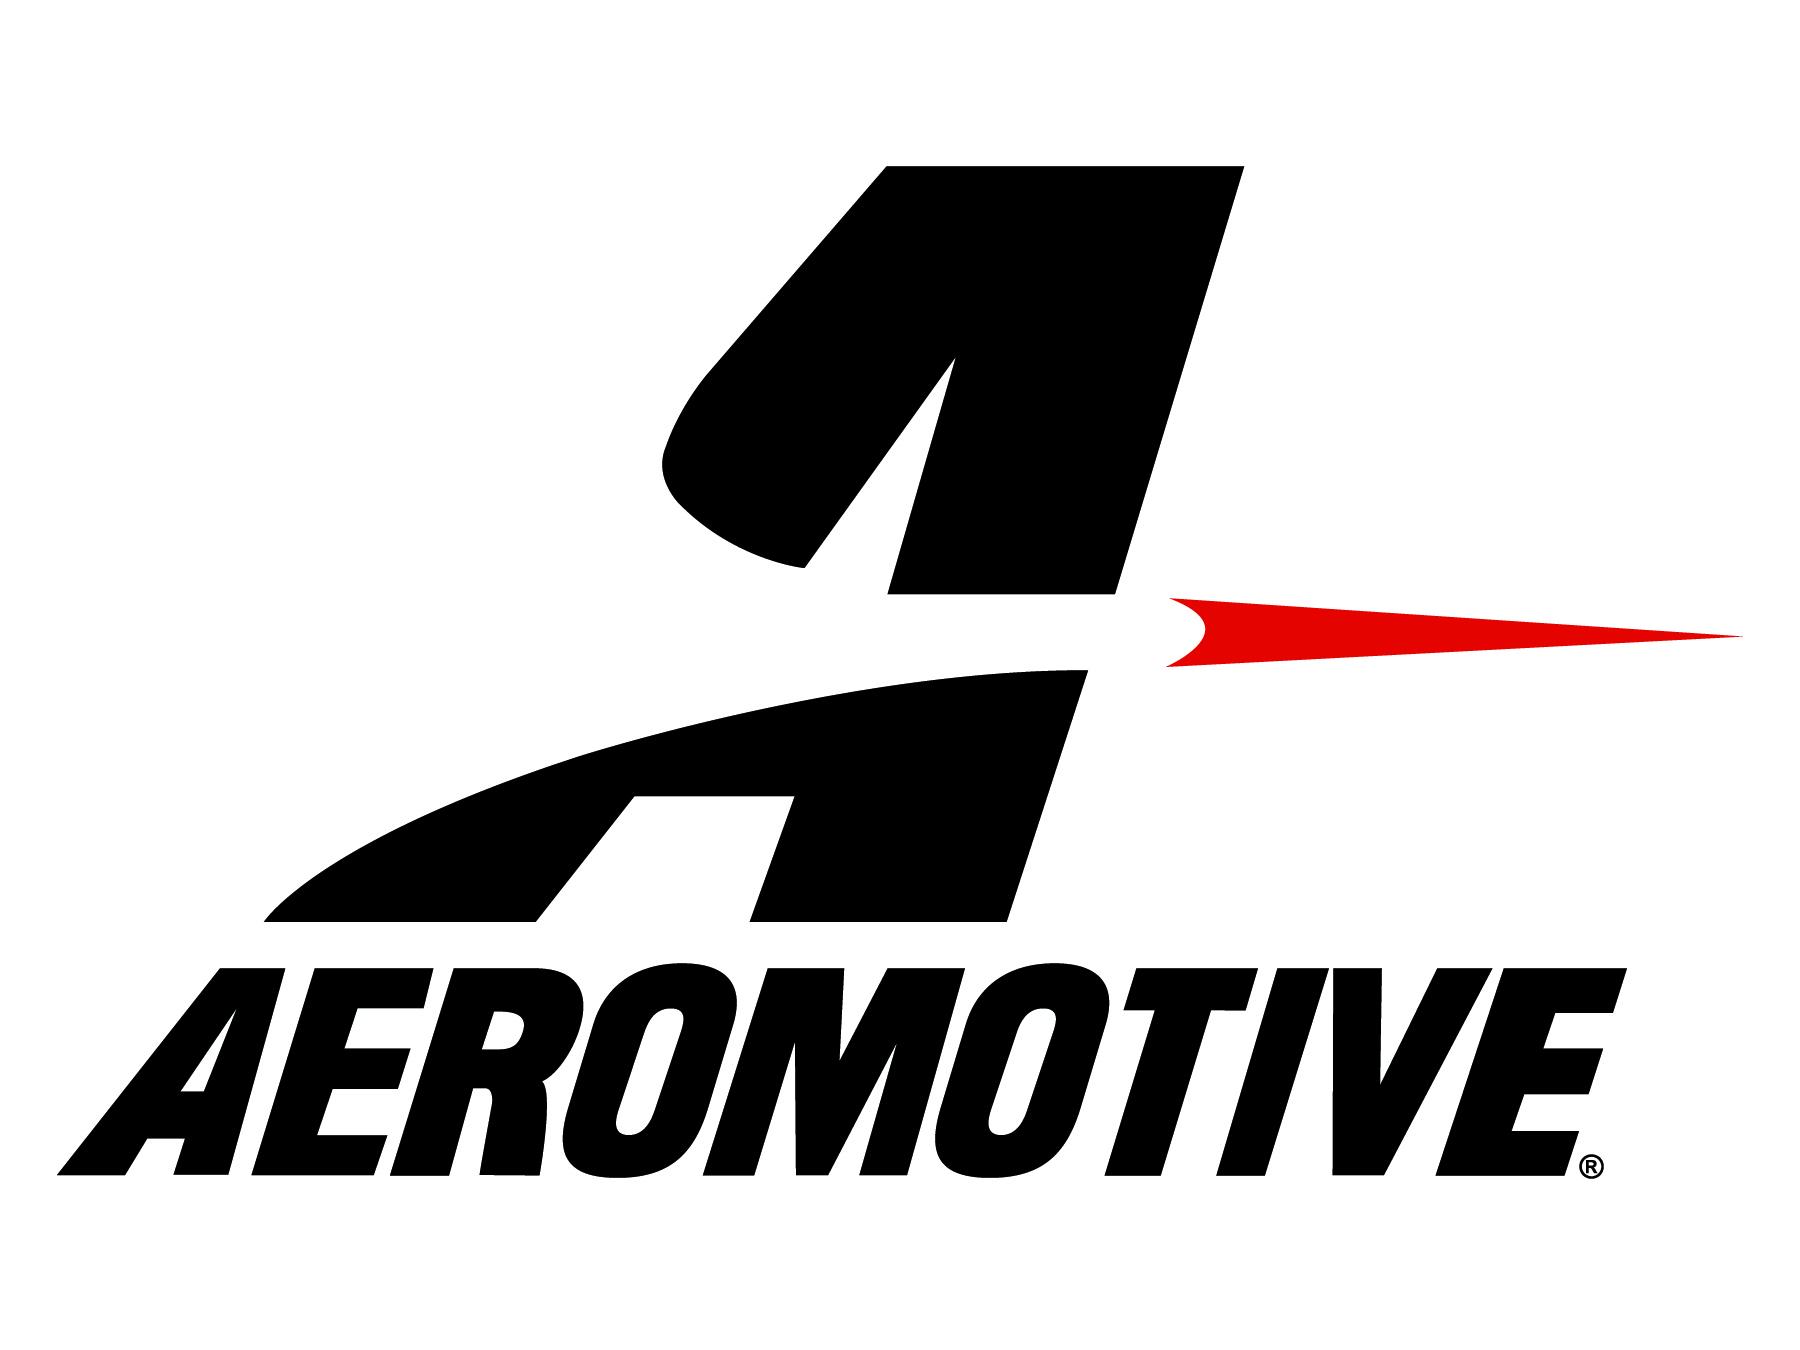 AEROMOTIVE, INC.